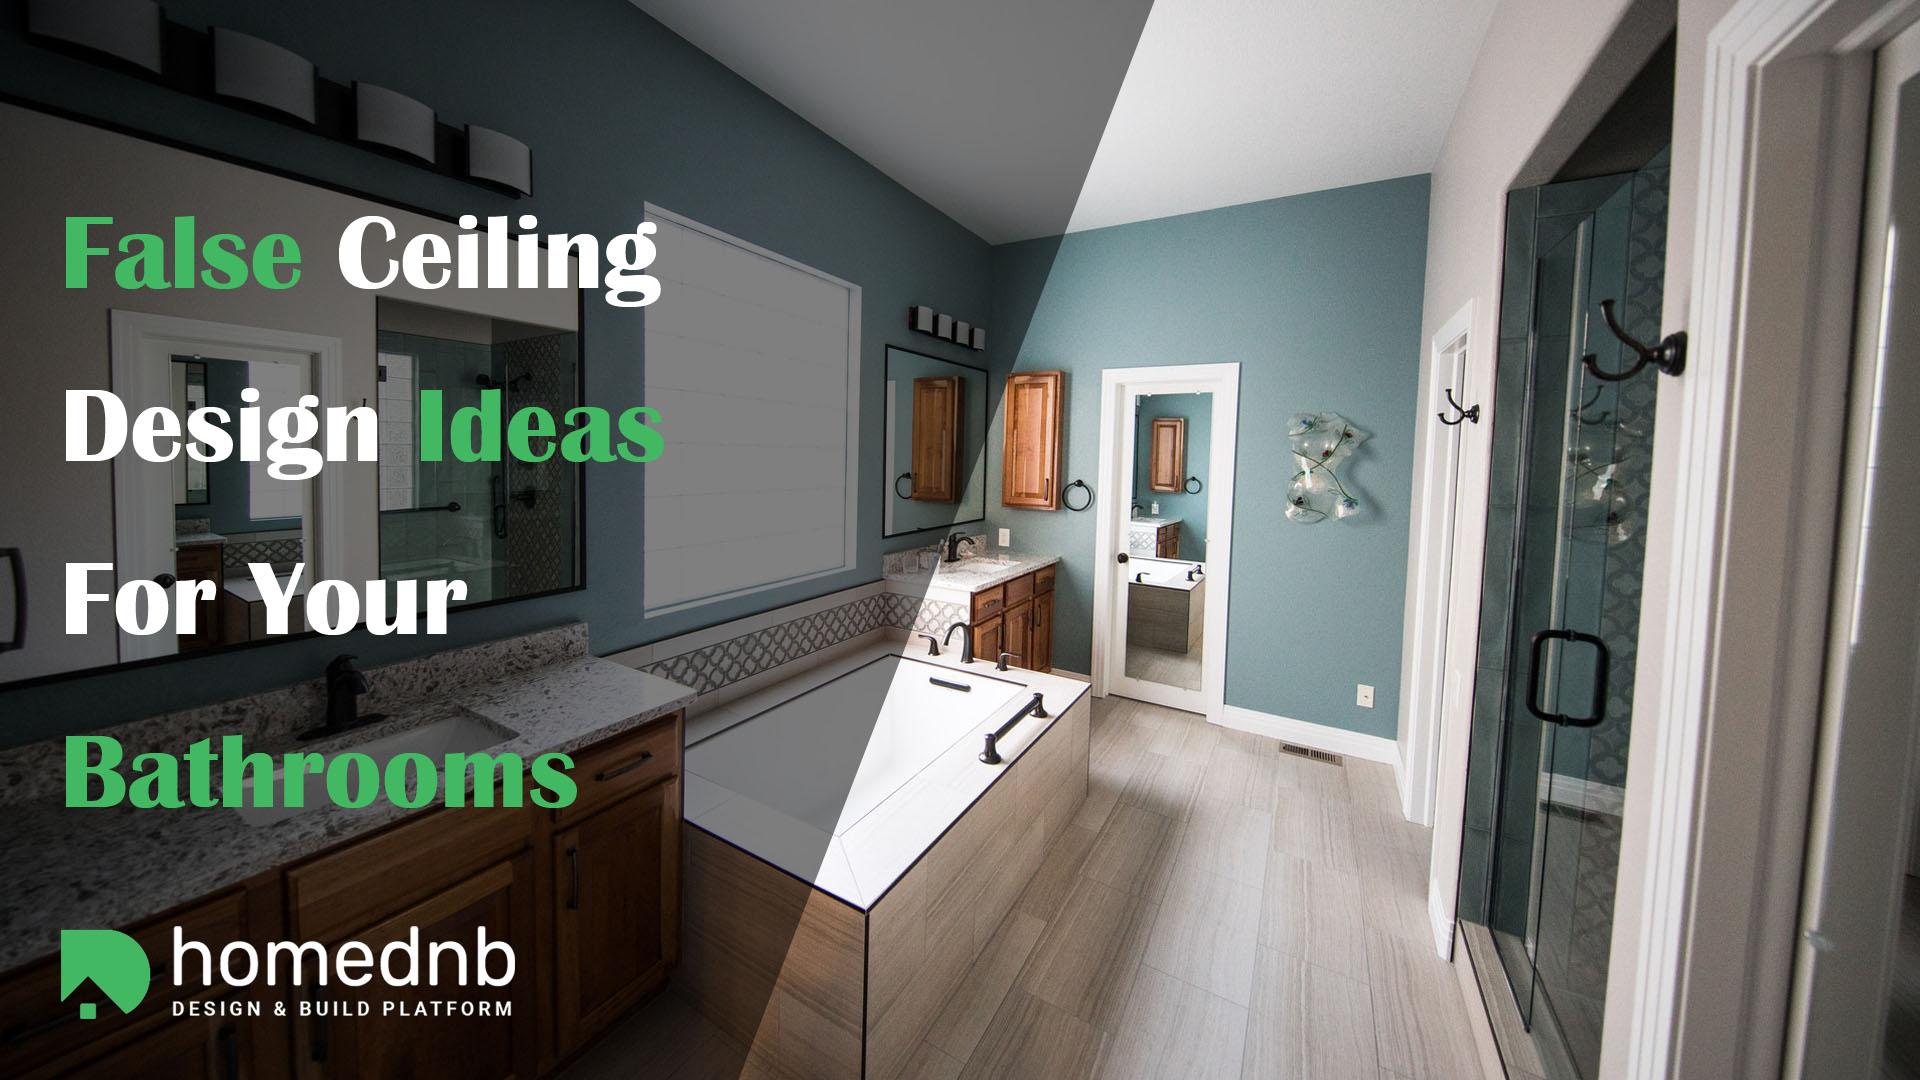 False Ceiling Design Ideas For Your Bathrooms